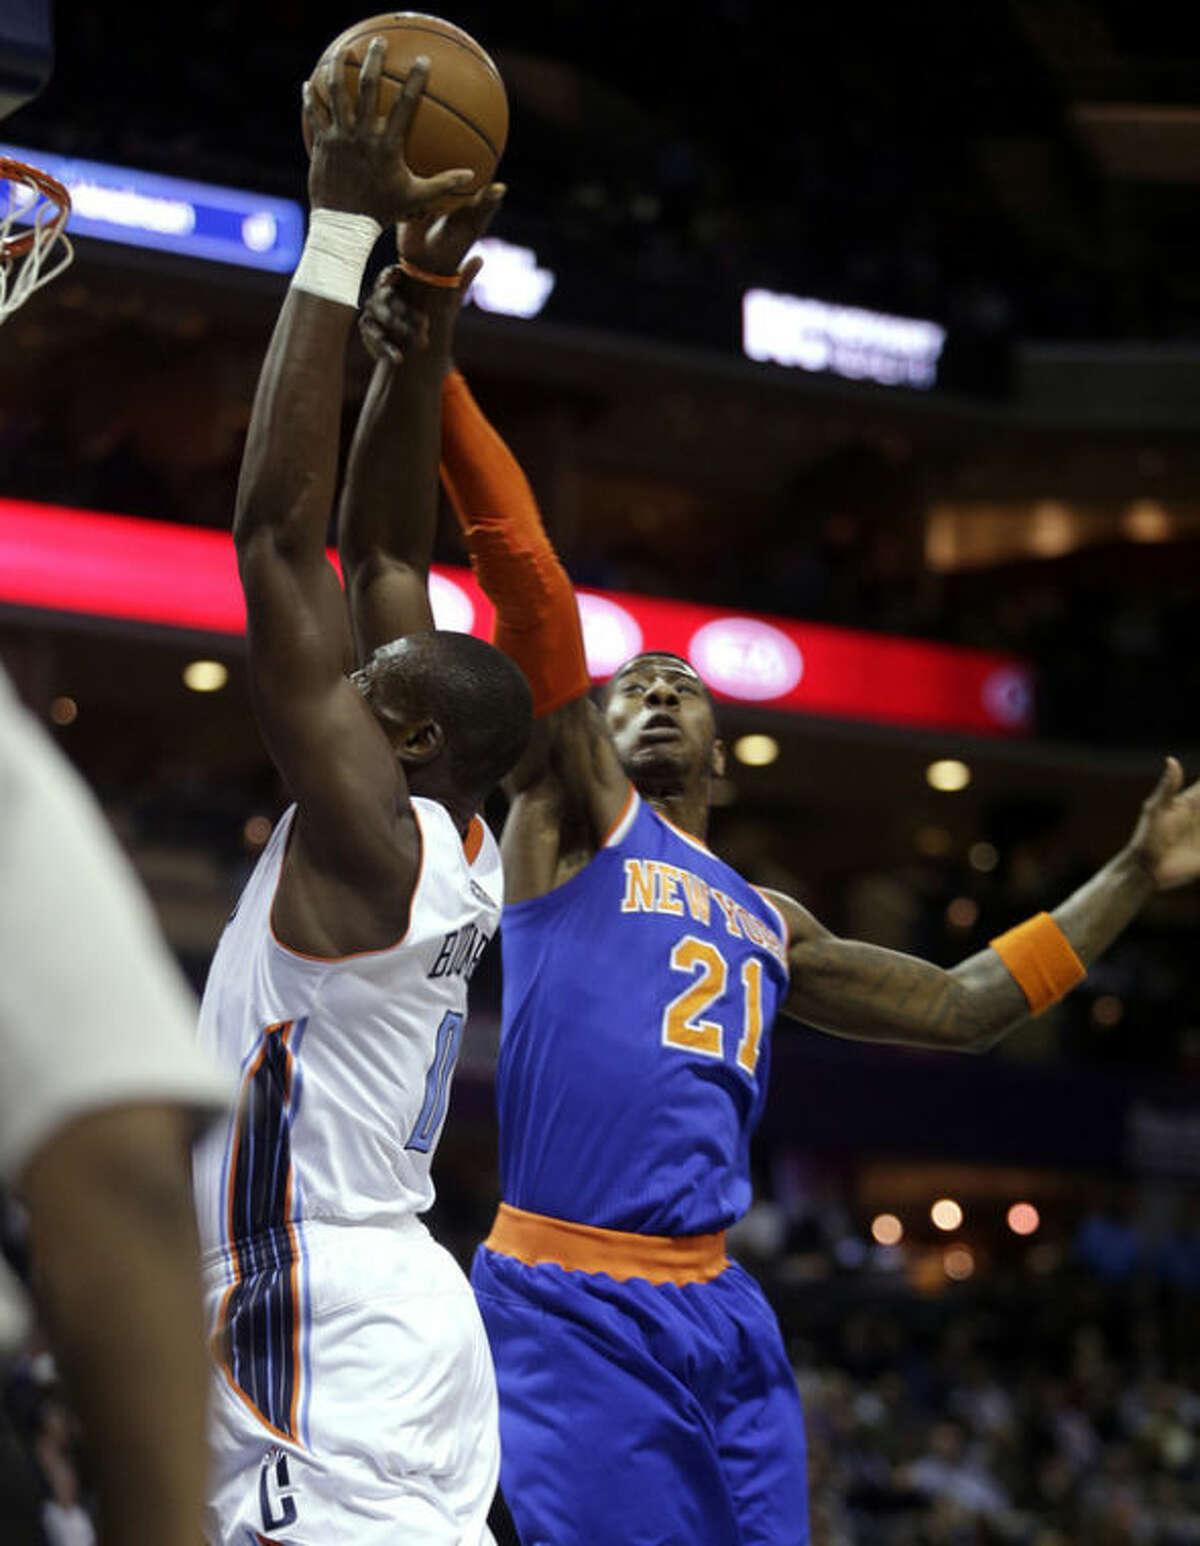 New York Knicks guard Iman Shumpert, right, fouls Charlotte Bobcats center Bismack Biyombo in the first half of an NBA basketball game in Charlotte, N.C., Friday, Nov. 8, 2013. (AP Photo/Nell Redmond)